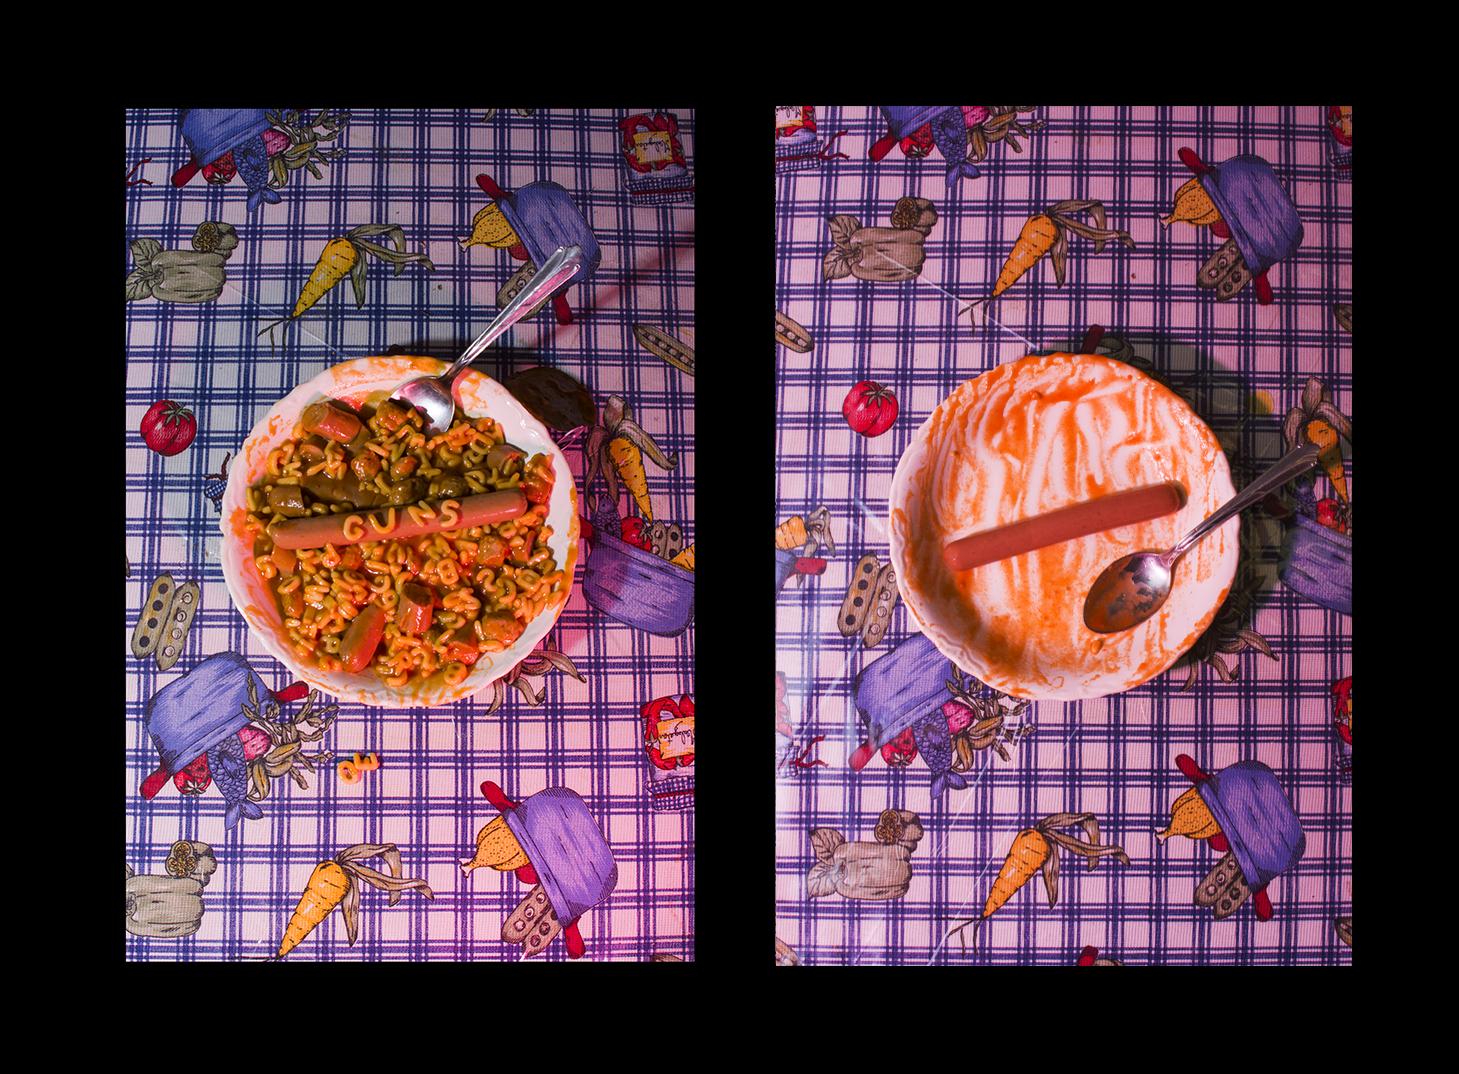 foodfinal.jpg